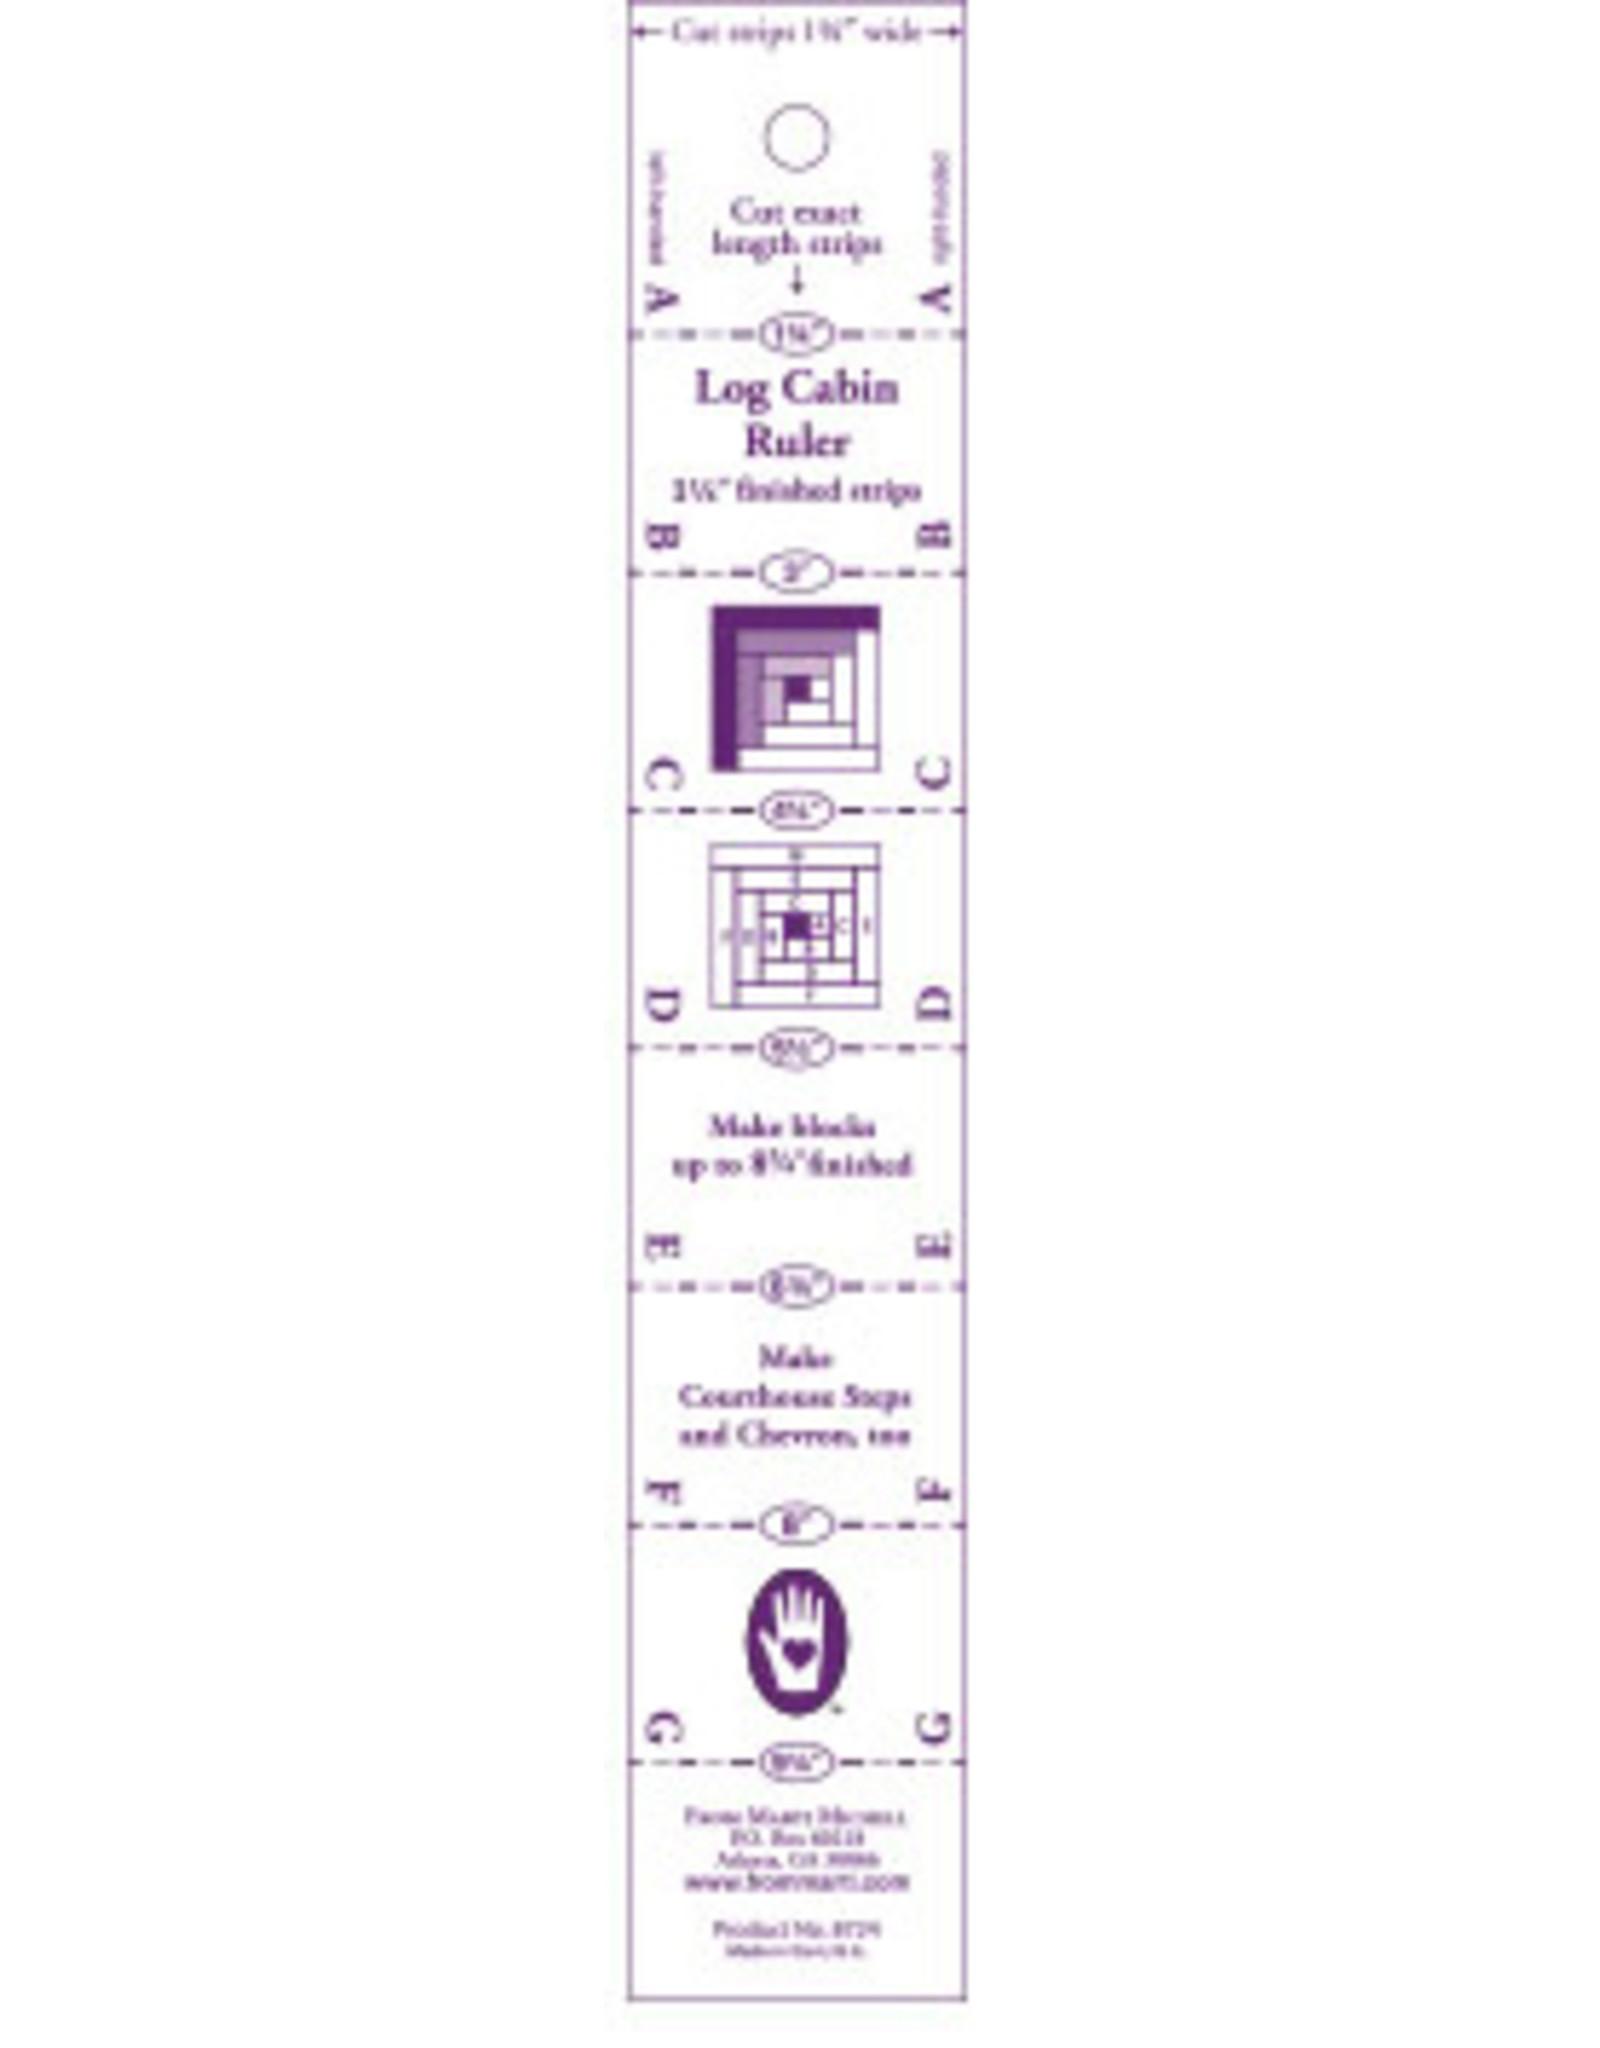 Log Cabin Ruler - 10 x 10 inch precut squares